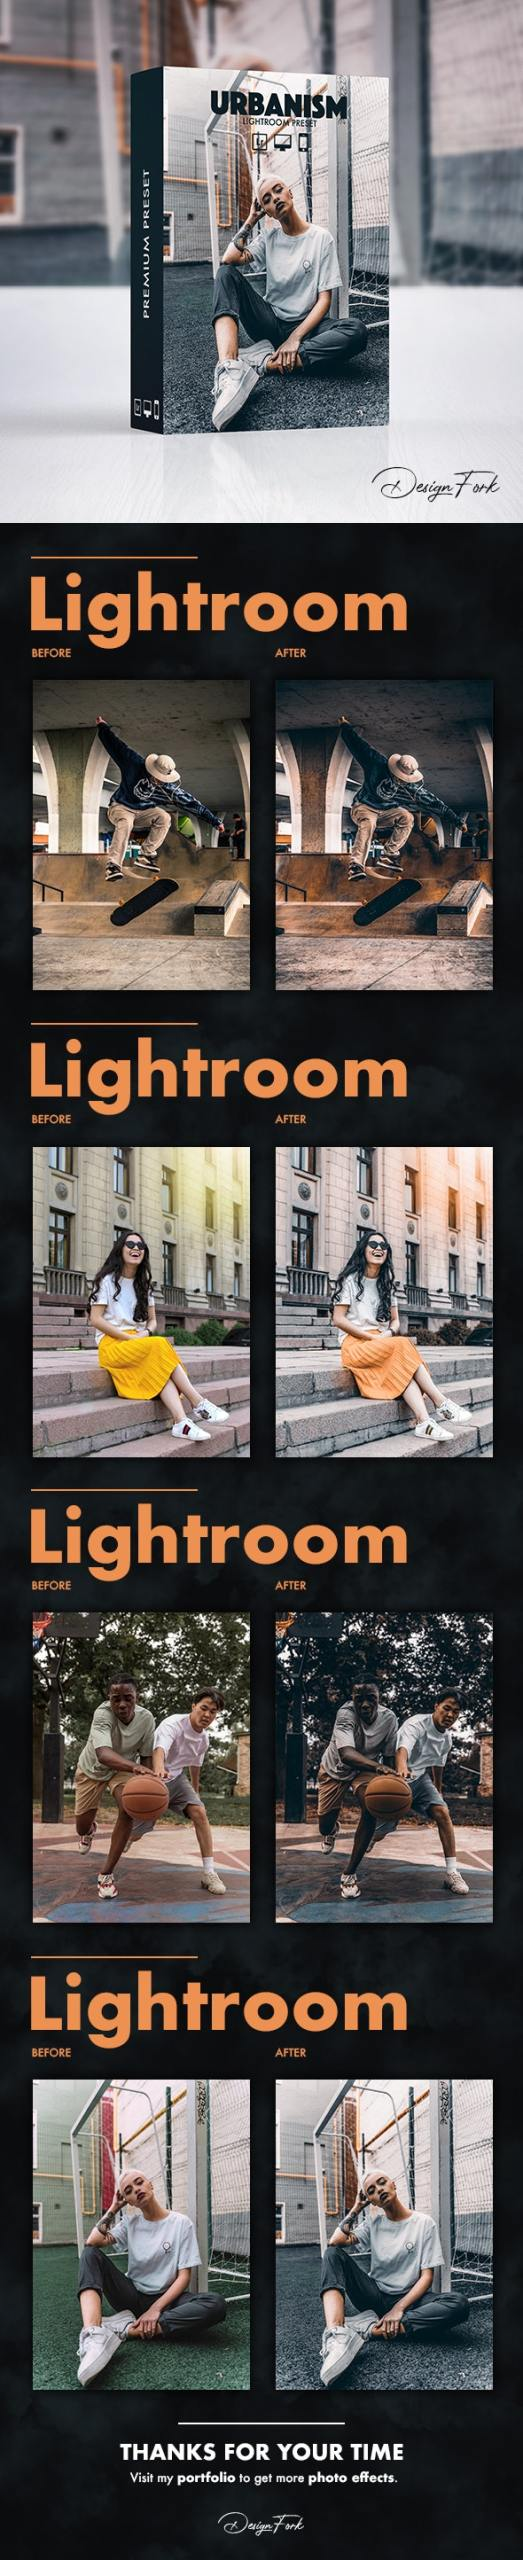 Urbanism FX Lightroom Preset 30141897